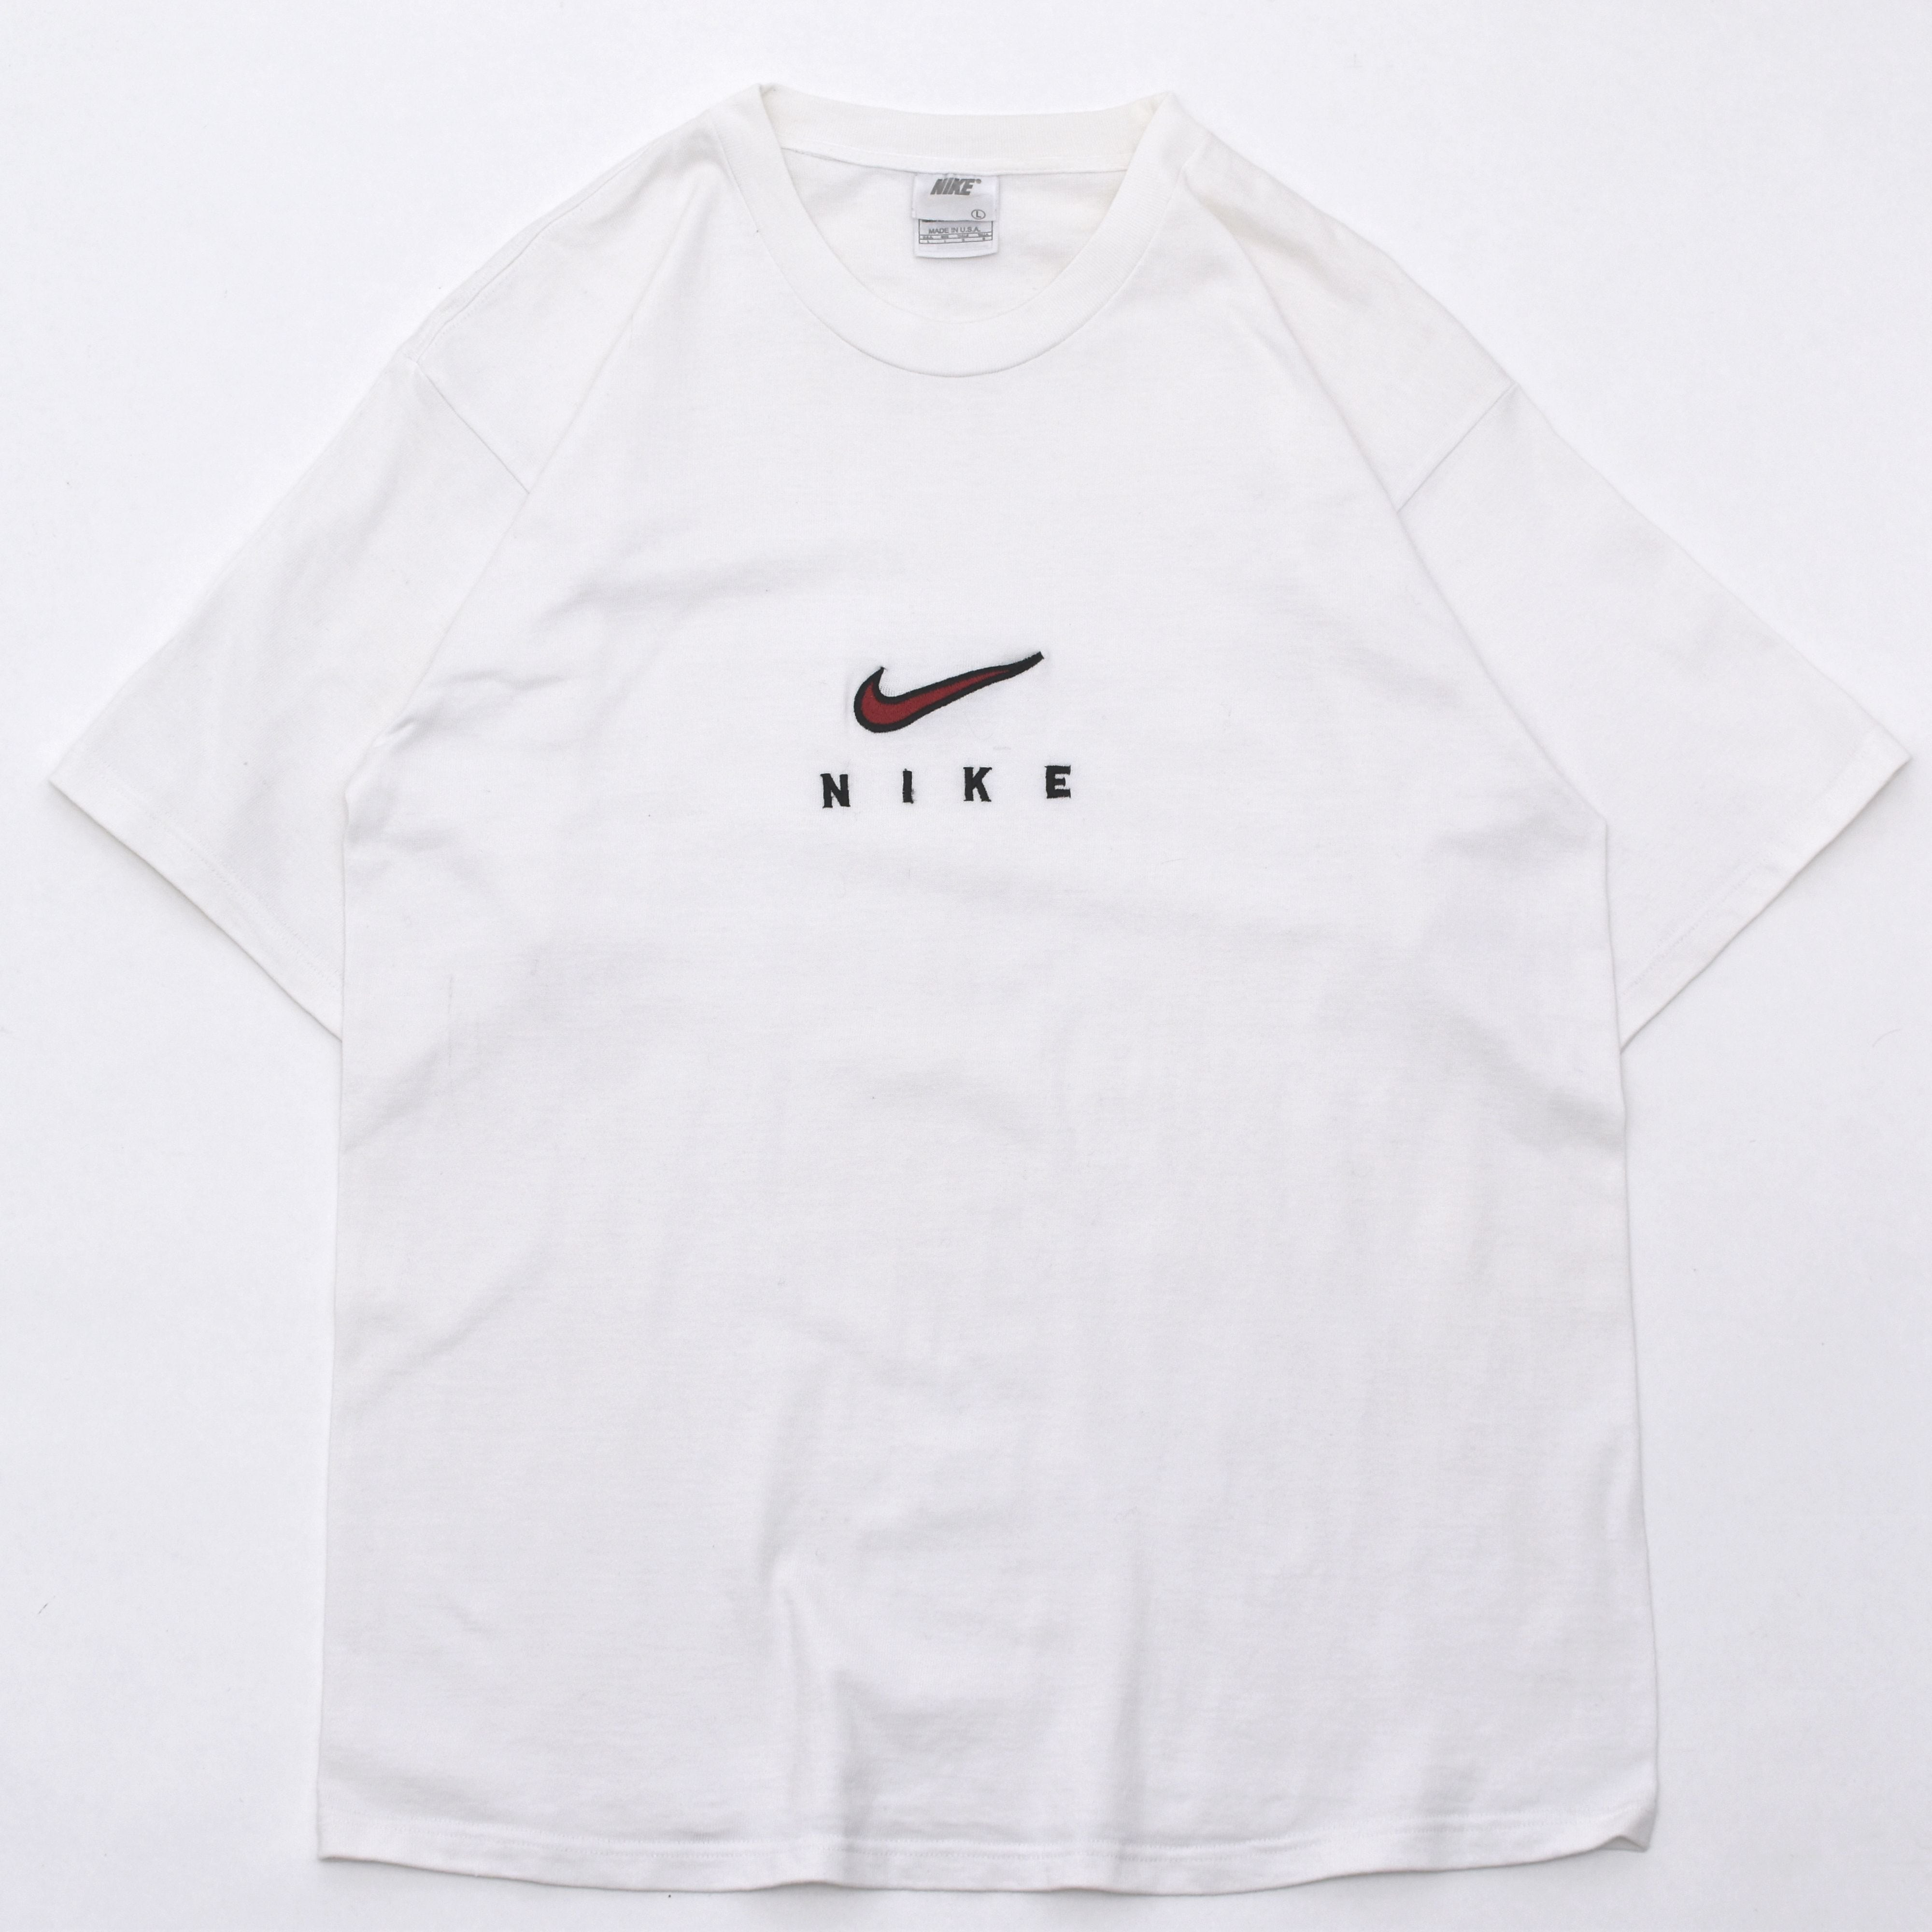 USA Made  90s vintage NIKE logo T shirt